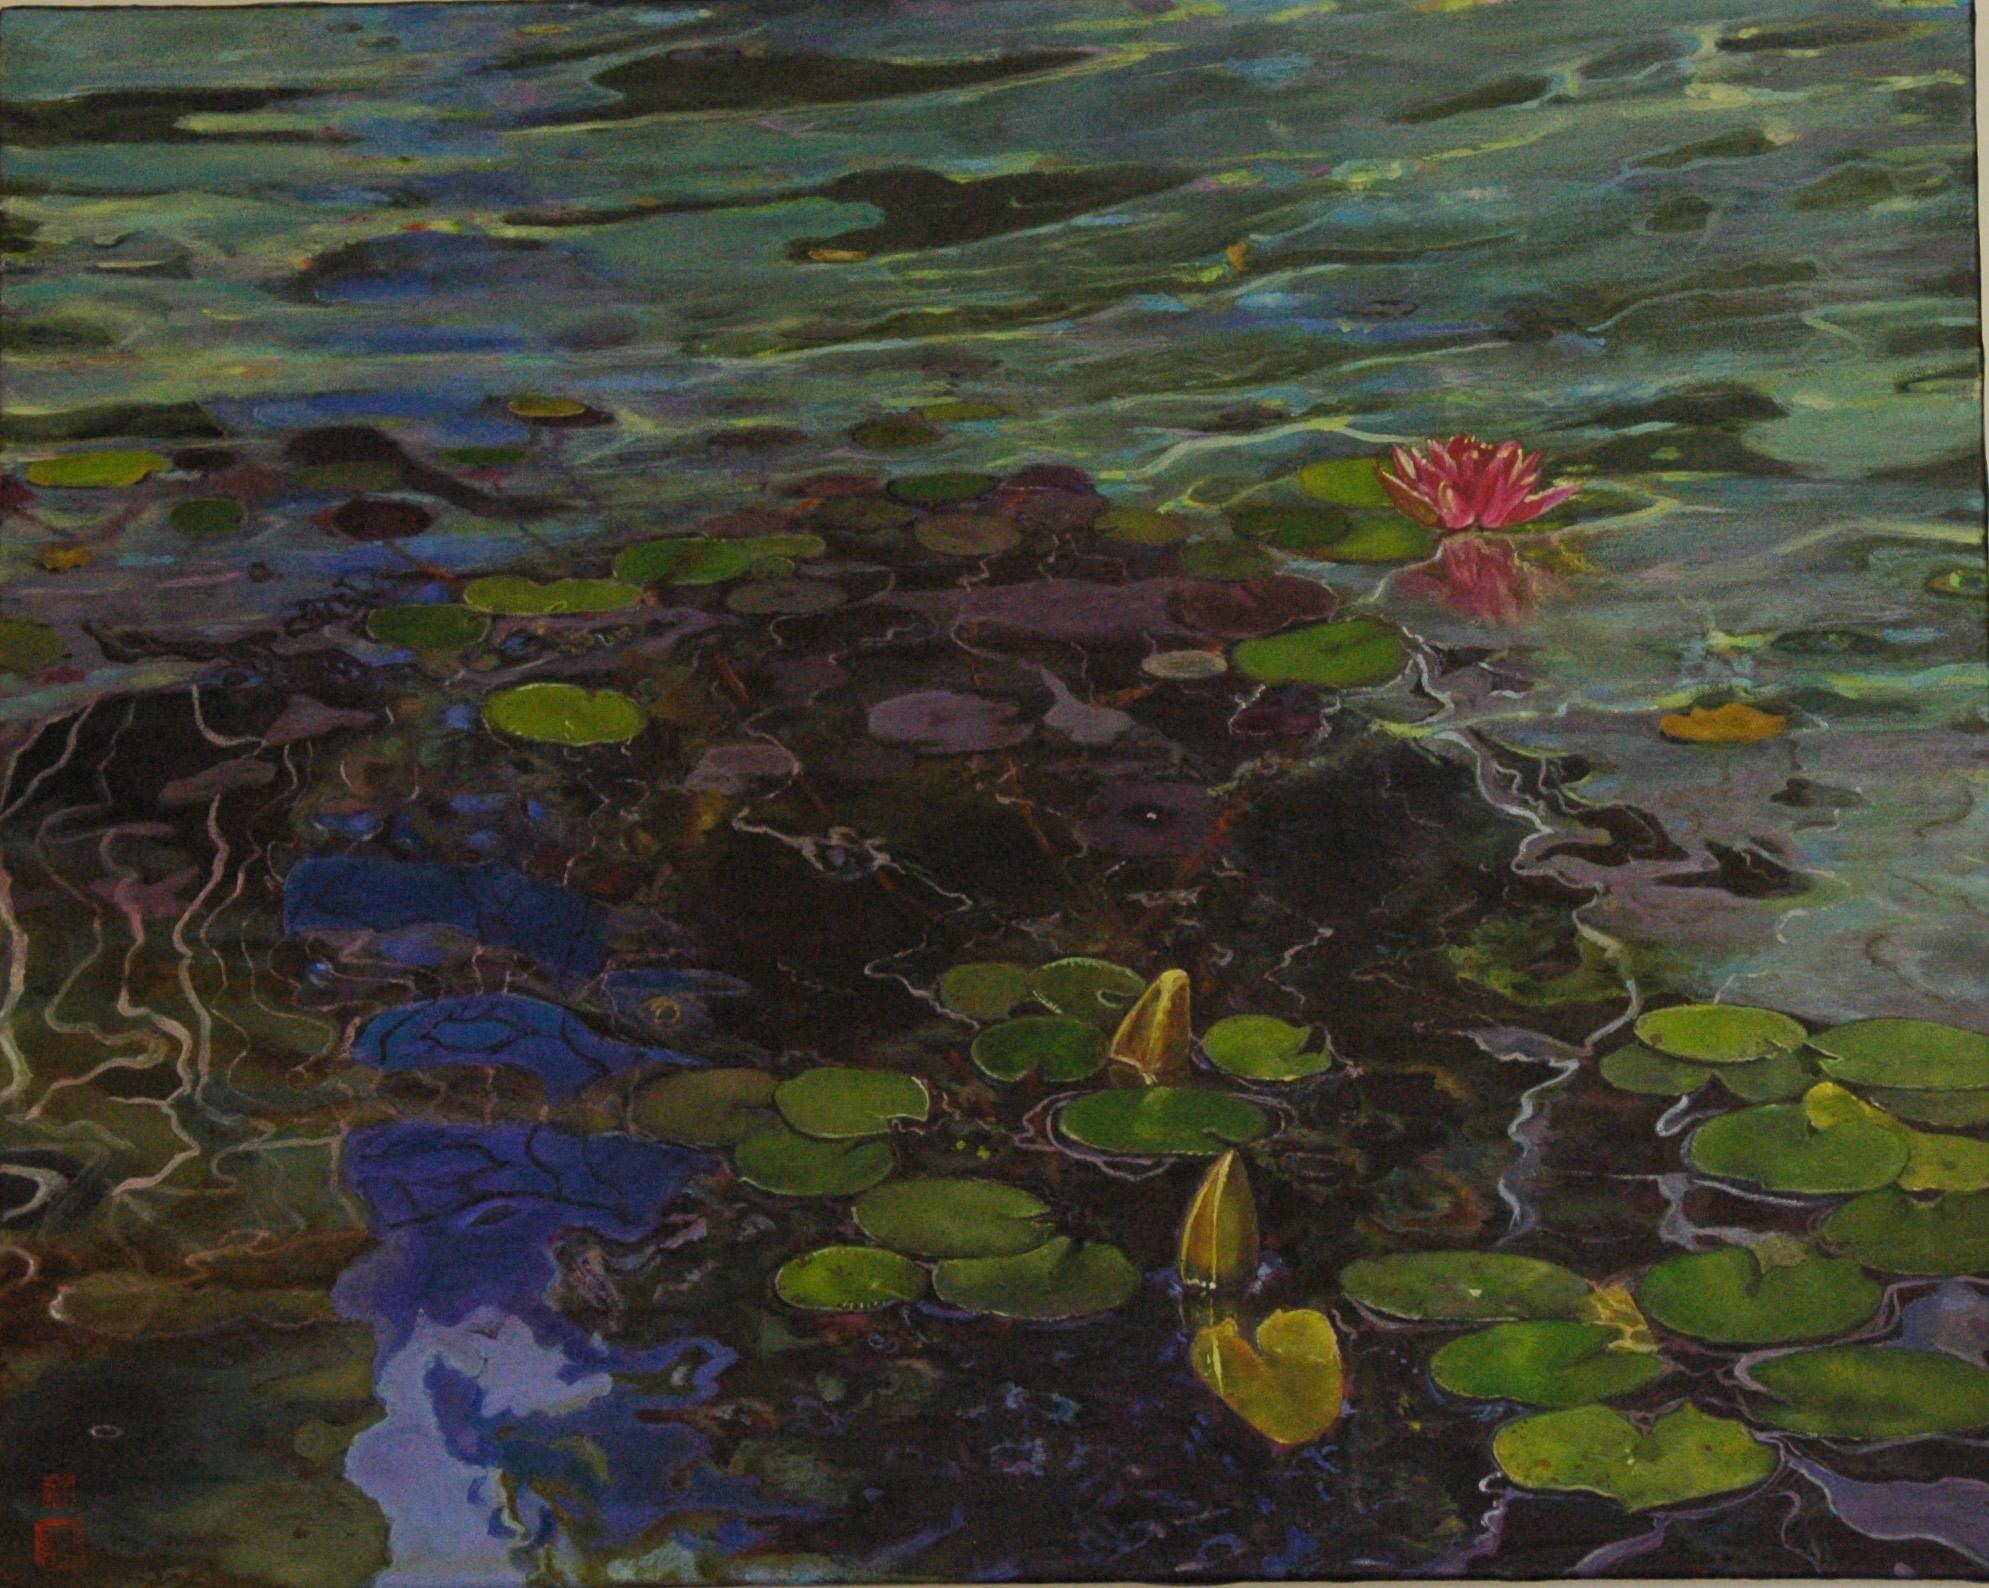 Skirball Pond